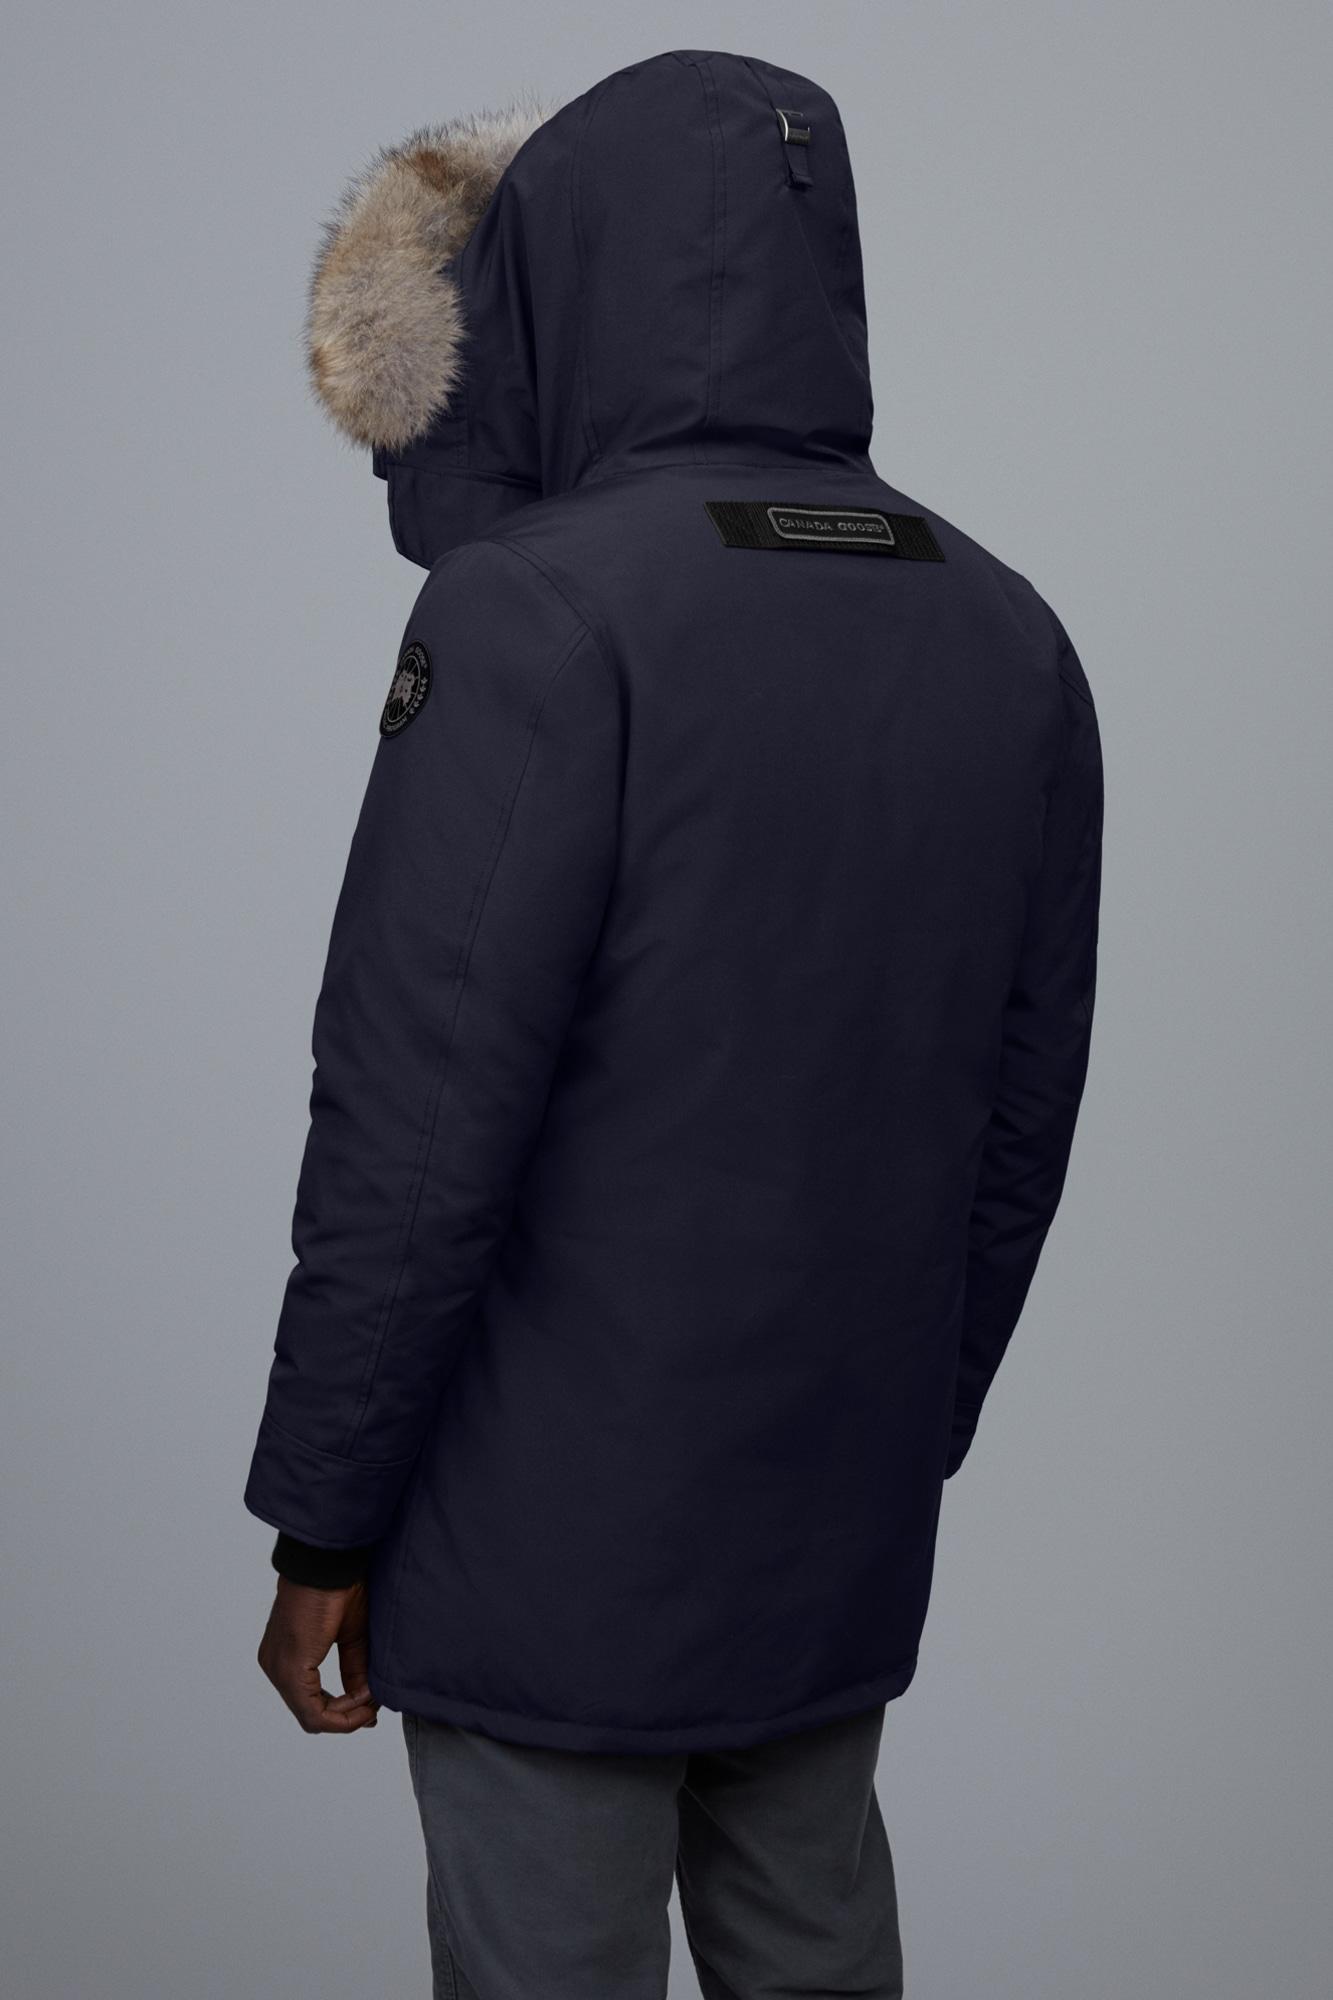 Langford Parka Black Label  09233c3d5b80